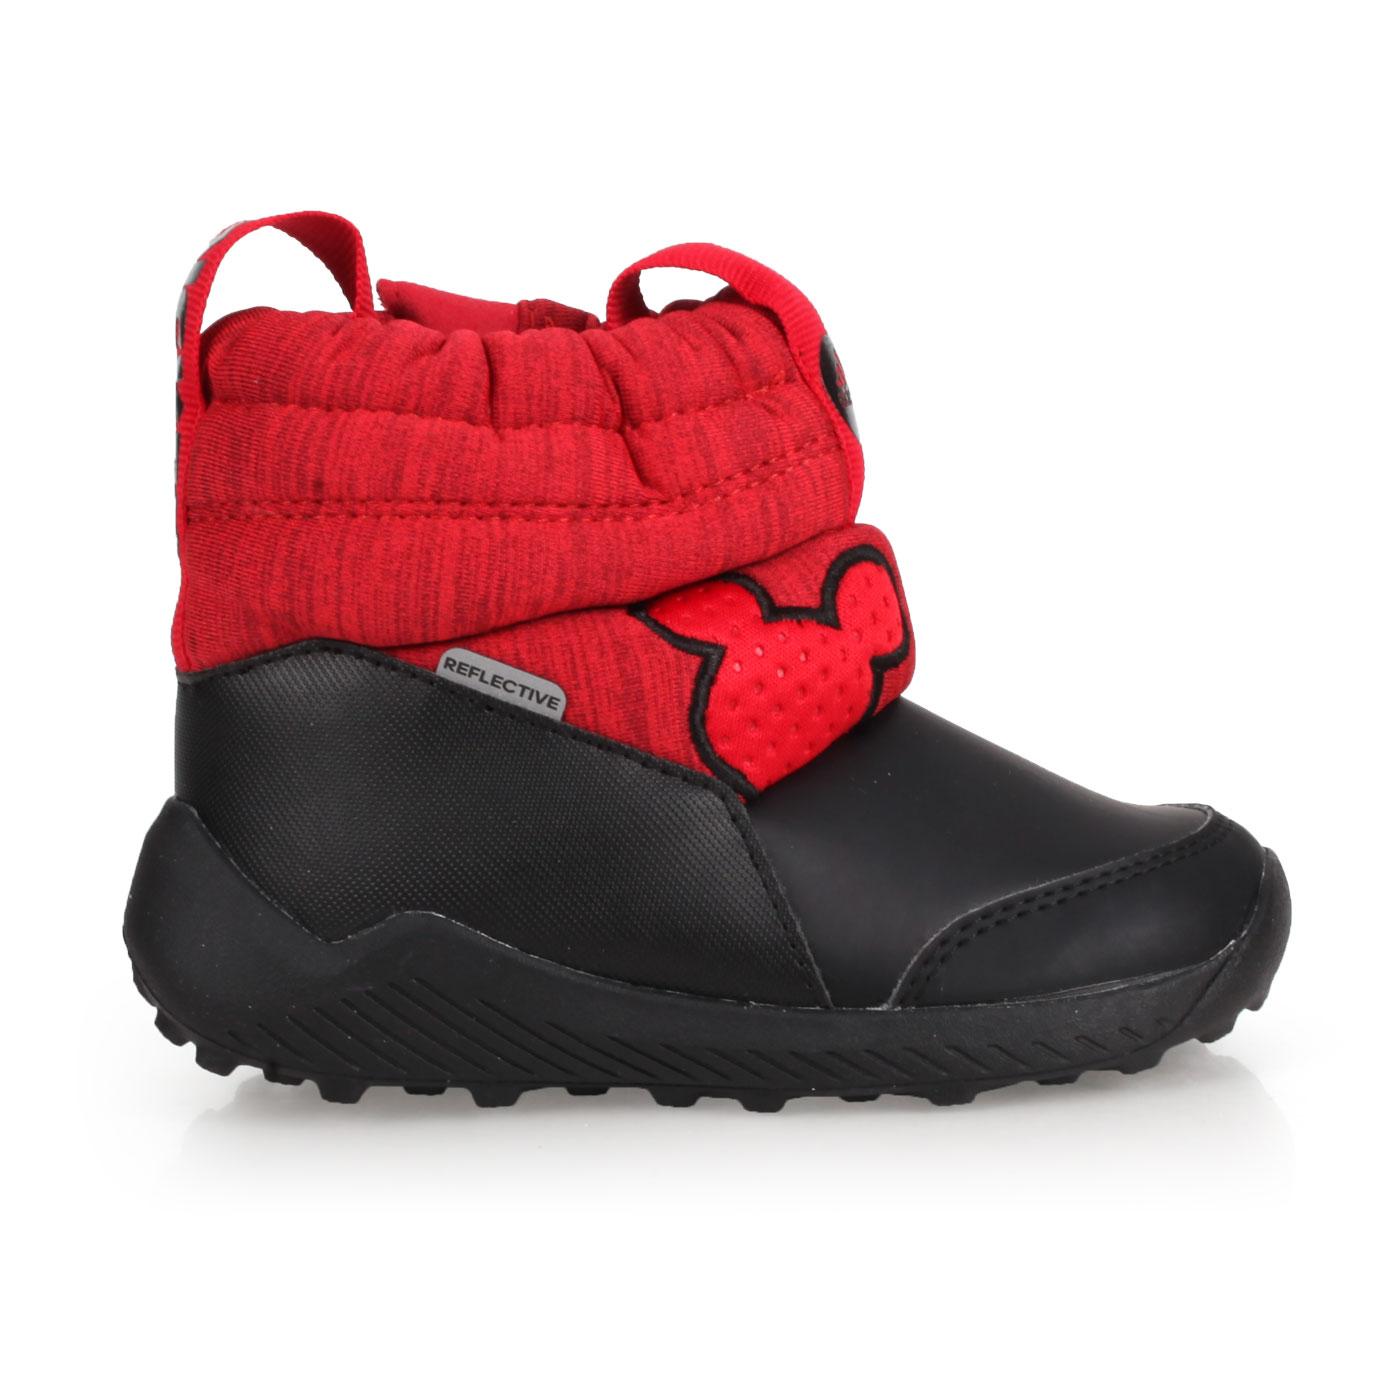 ADIDAS 小童保暖短筒靴  @RapidaSnow Mickey I@G27540 - 黑紅